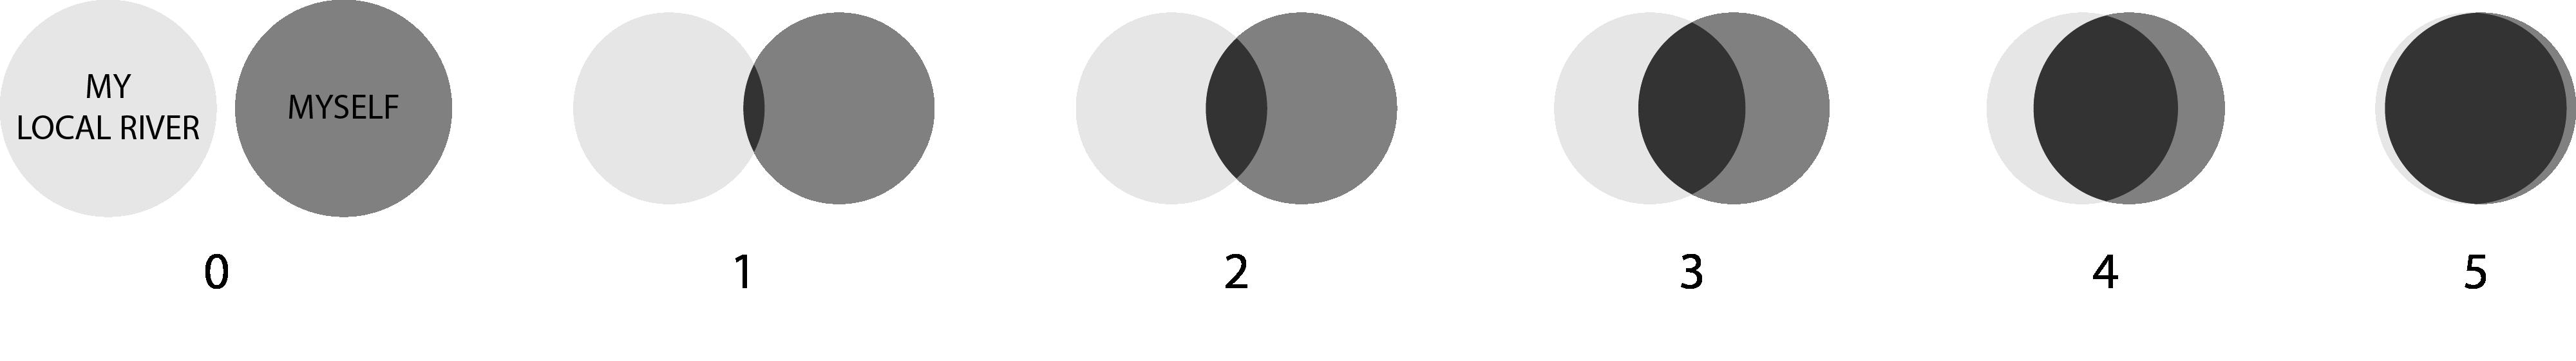 Two circles representing